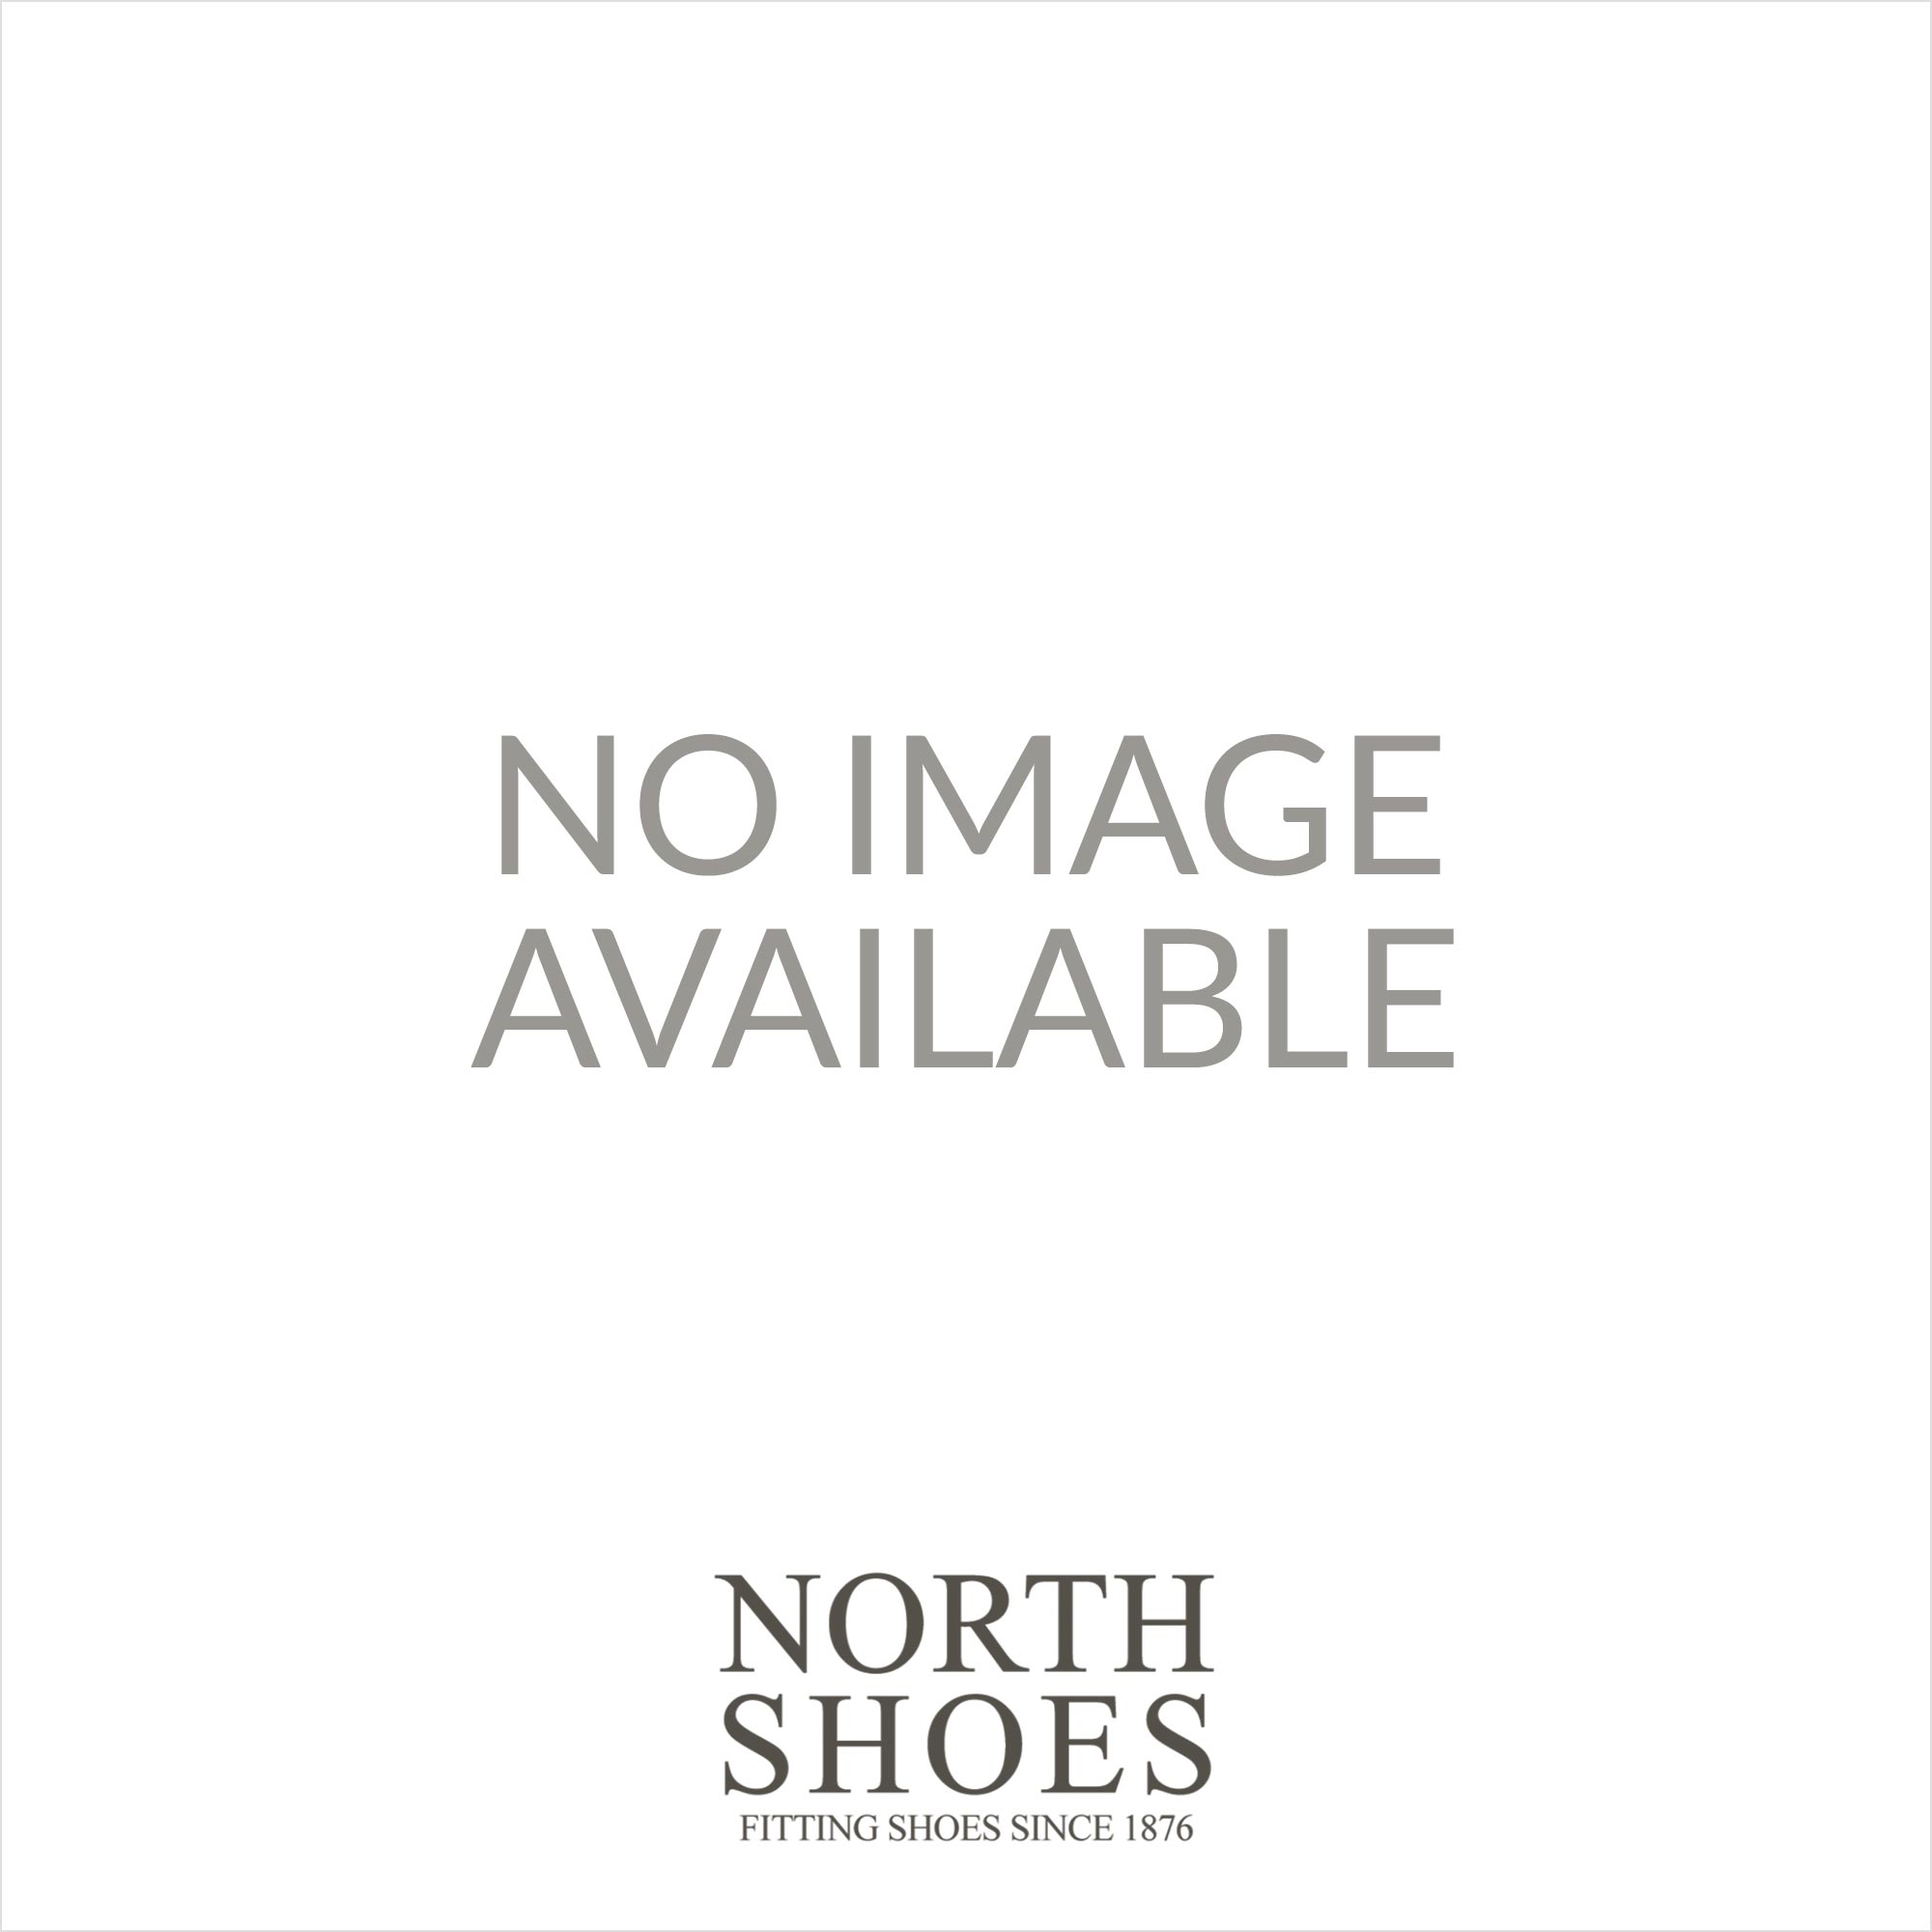 b0e5971c2760 ... Clarks Dalia Rose Taupe Suede Leather Womens Slip On Heeled Court Shoe  ...